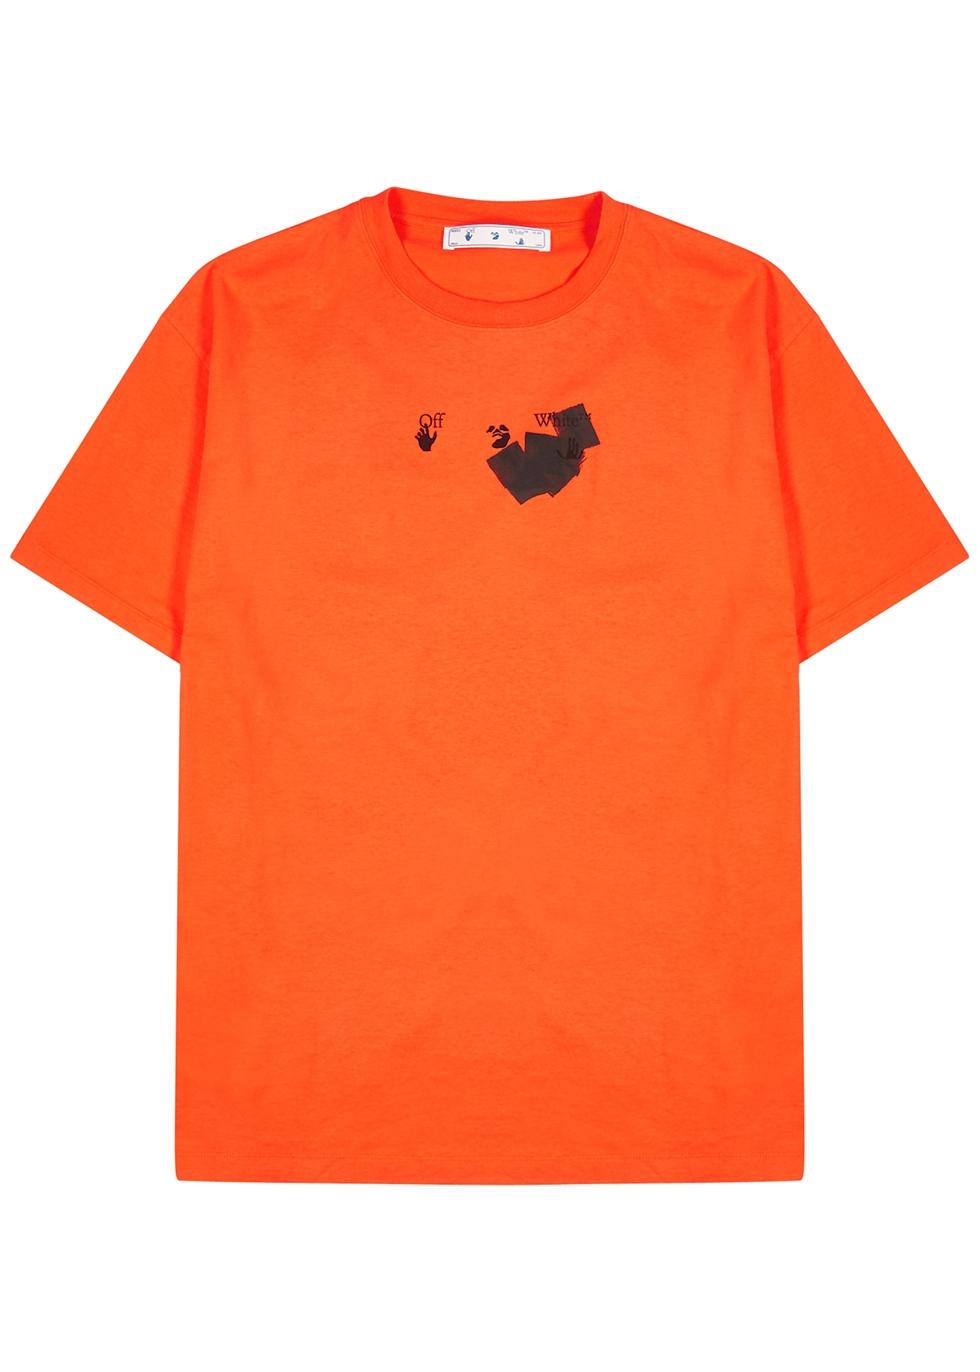 Jumbo Marker printed cotton T-shirt